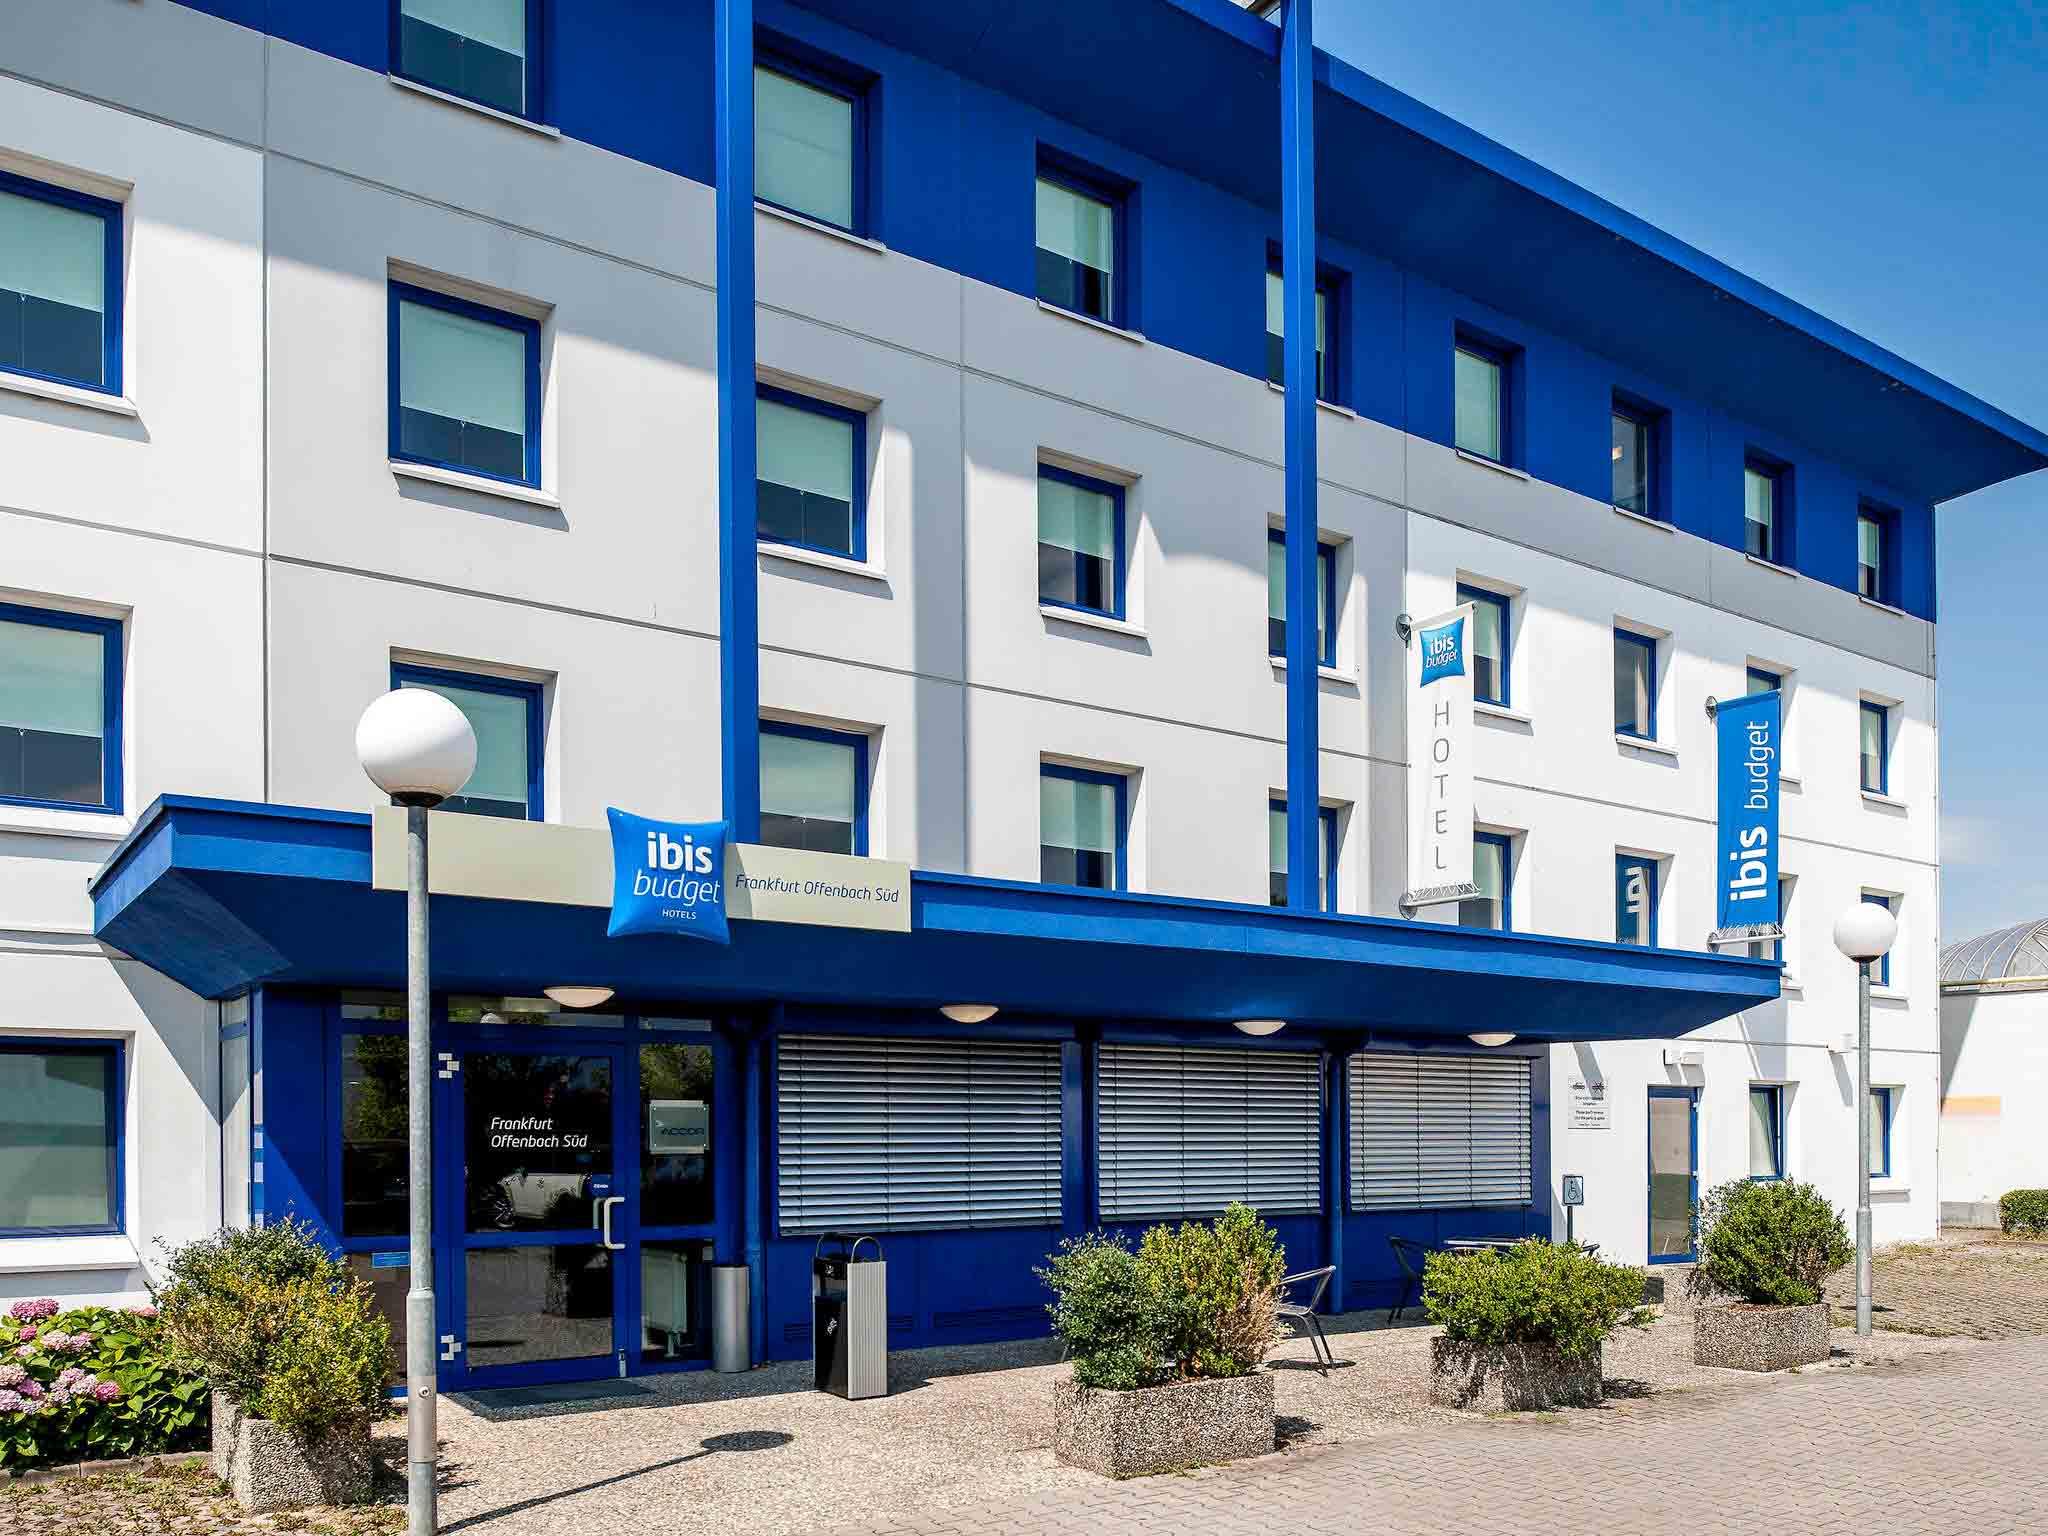 Hotel - ibis budget Frankfurt Offenbach Sued